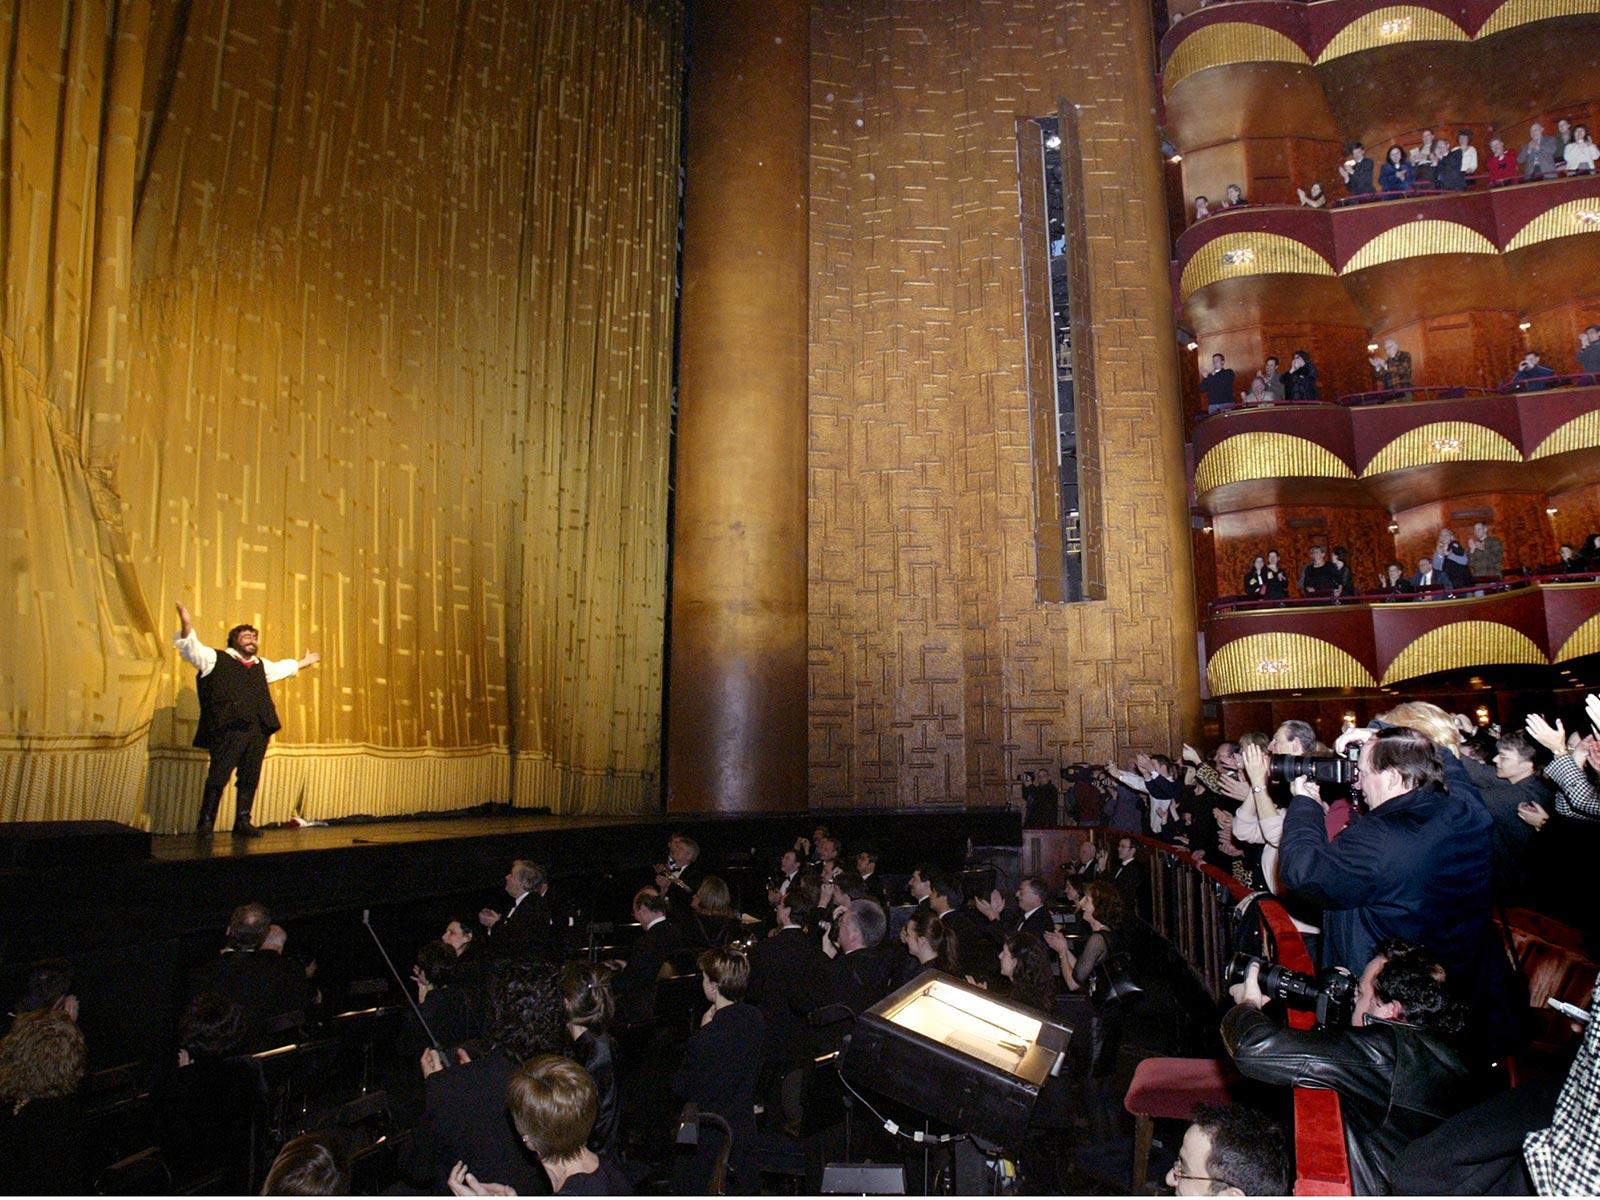 Pavarotti Curtain Call 667E6405a.jpg